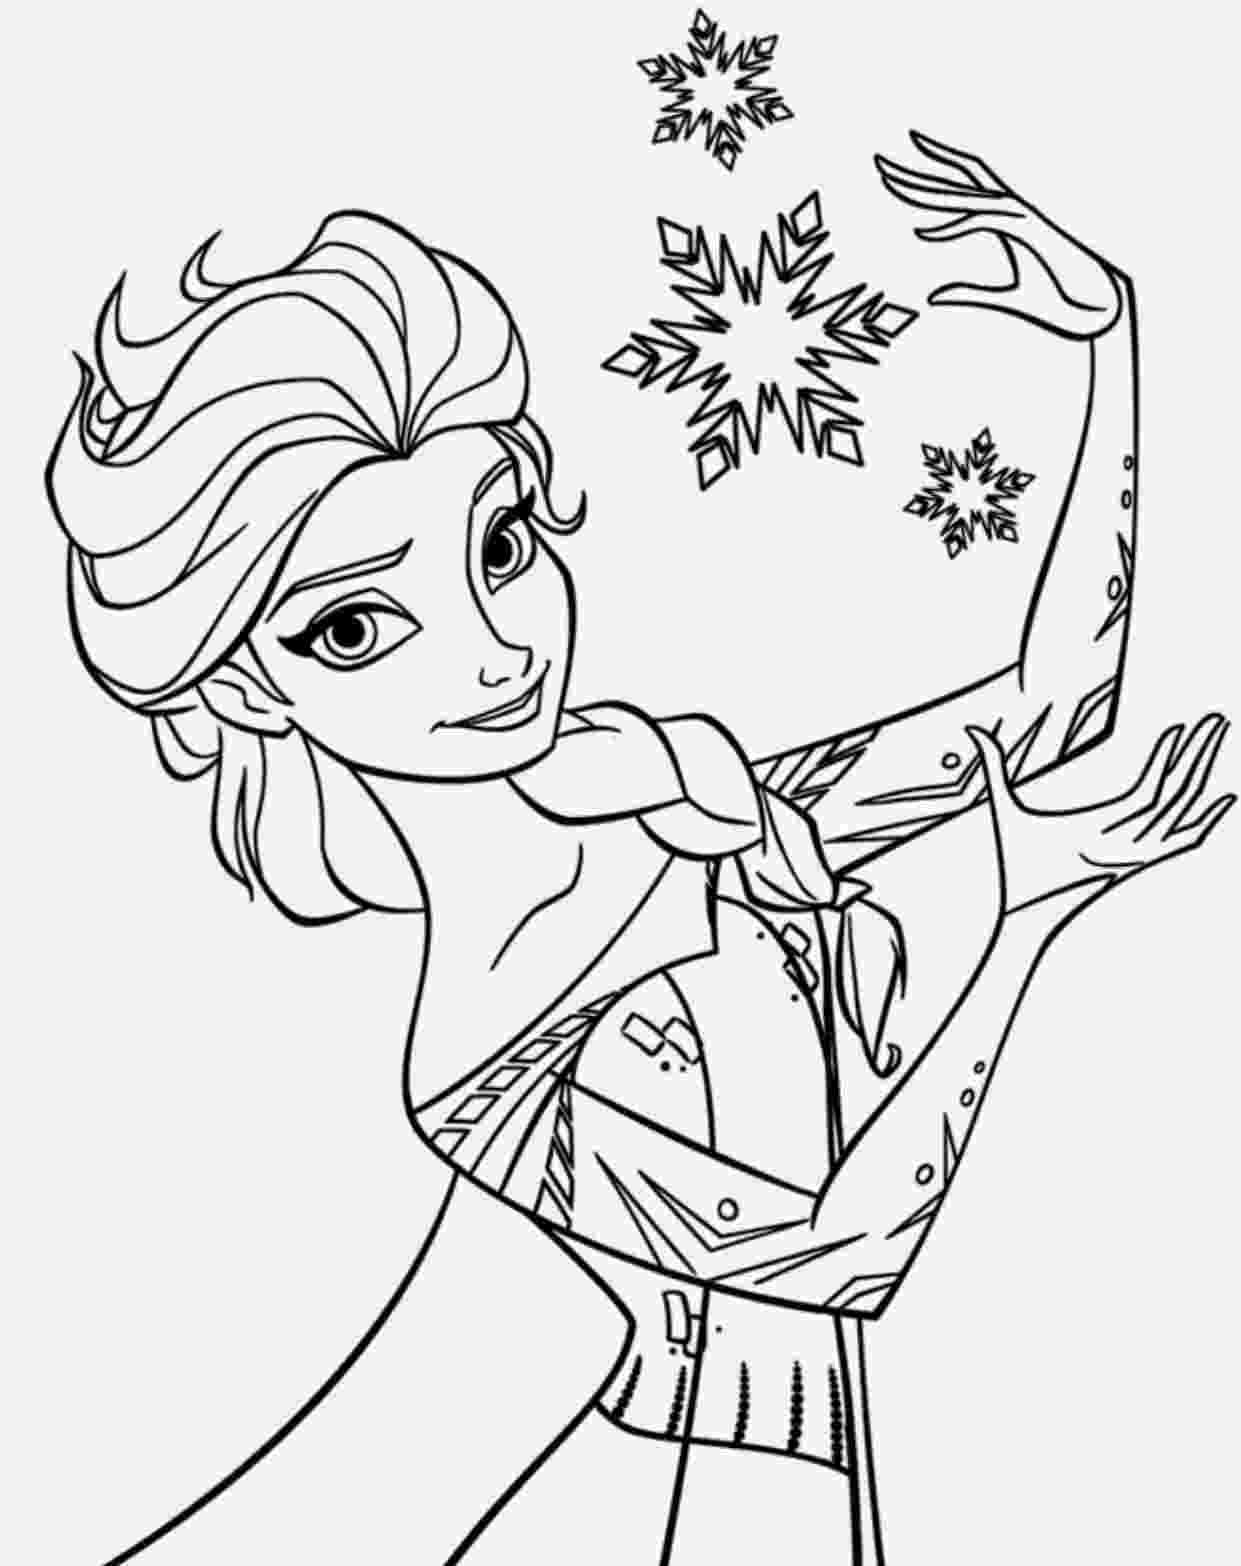 coloring frozen 15 beautiful disney frozen coloring pages free instant coloring frozen